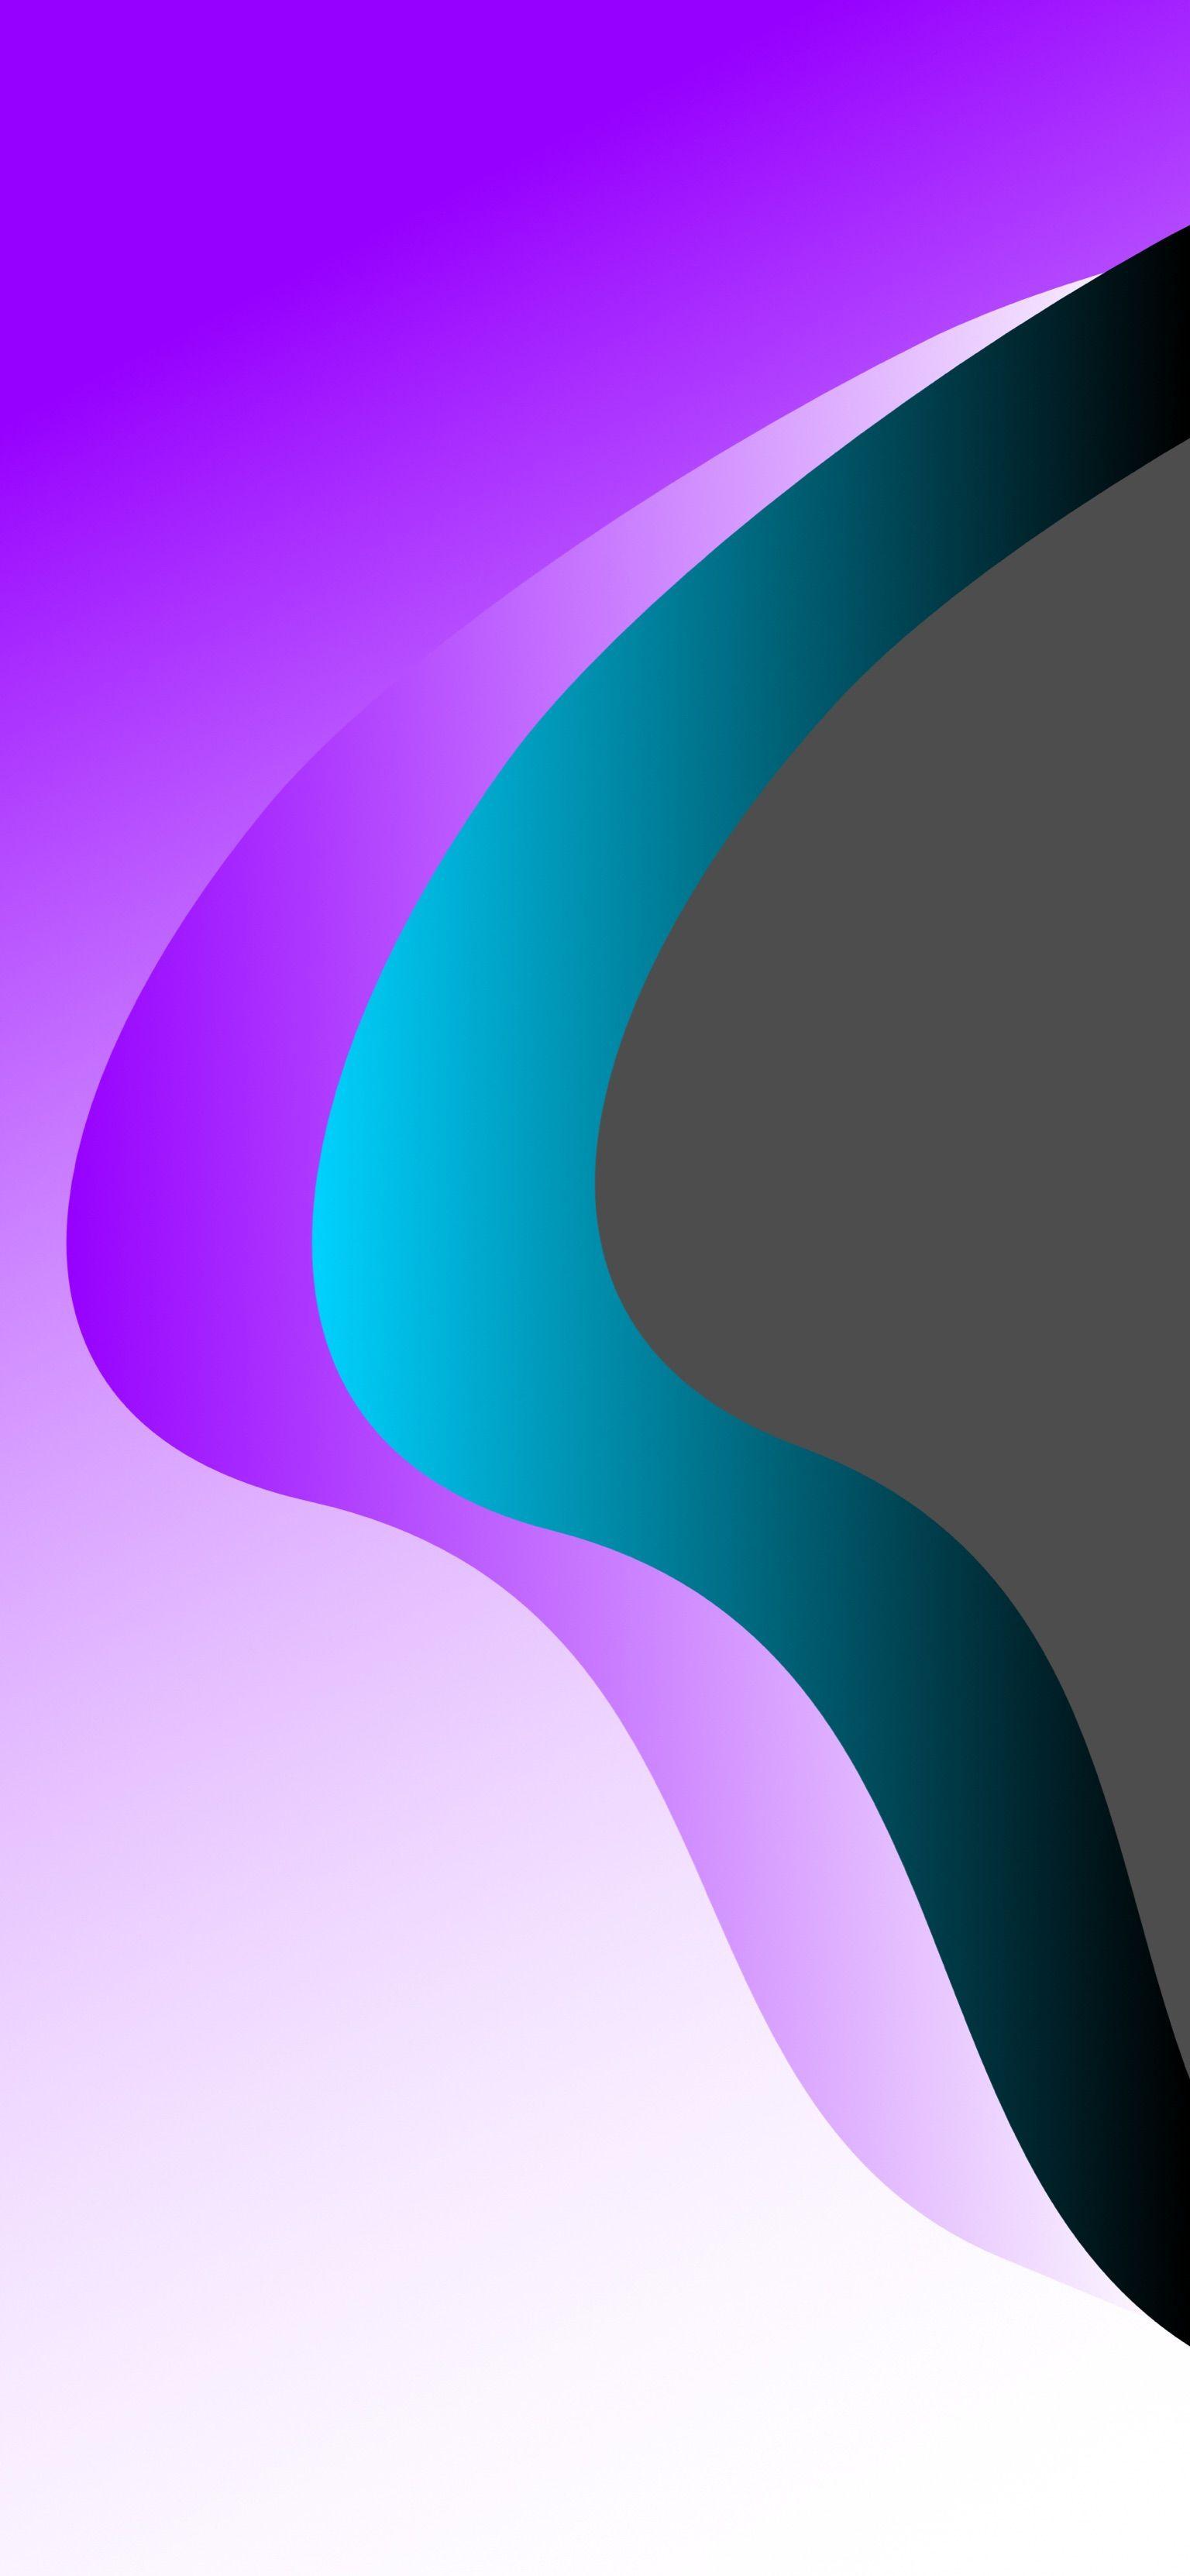 New Wallpaper Designed By C Hotspot4u Iphone Iphonewallpaper